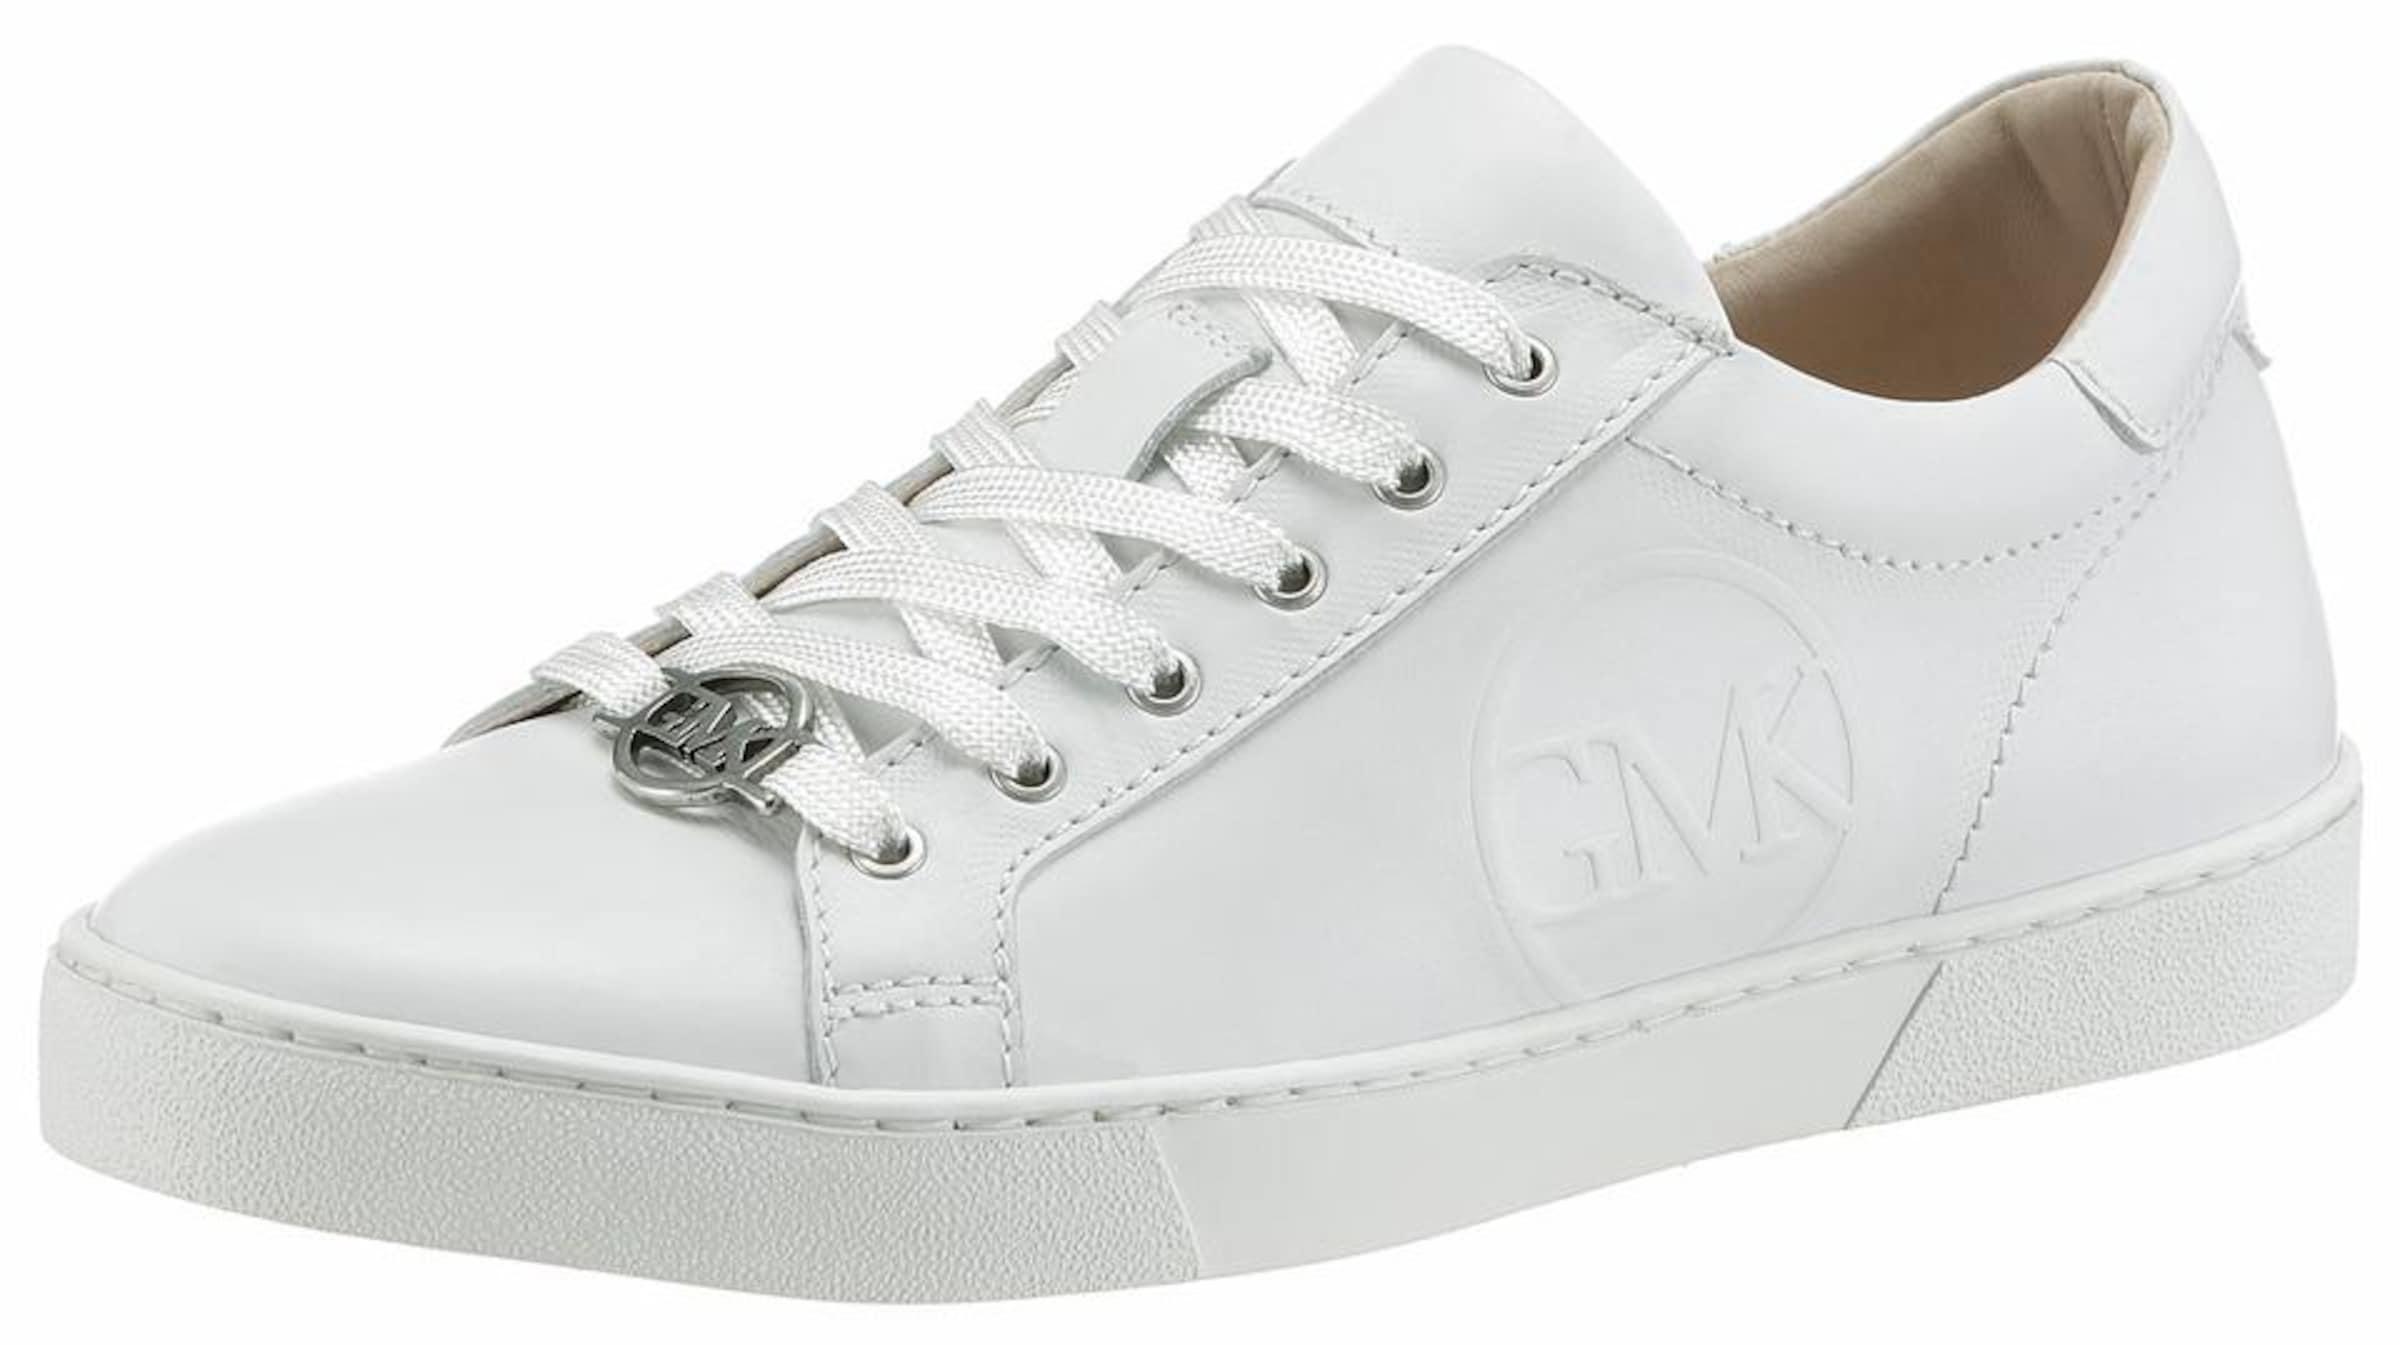 Maria Guido Sneaker Guido Maria Kretschmer nxzwYPqOH